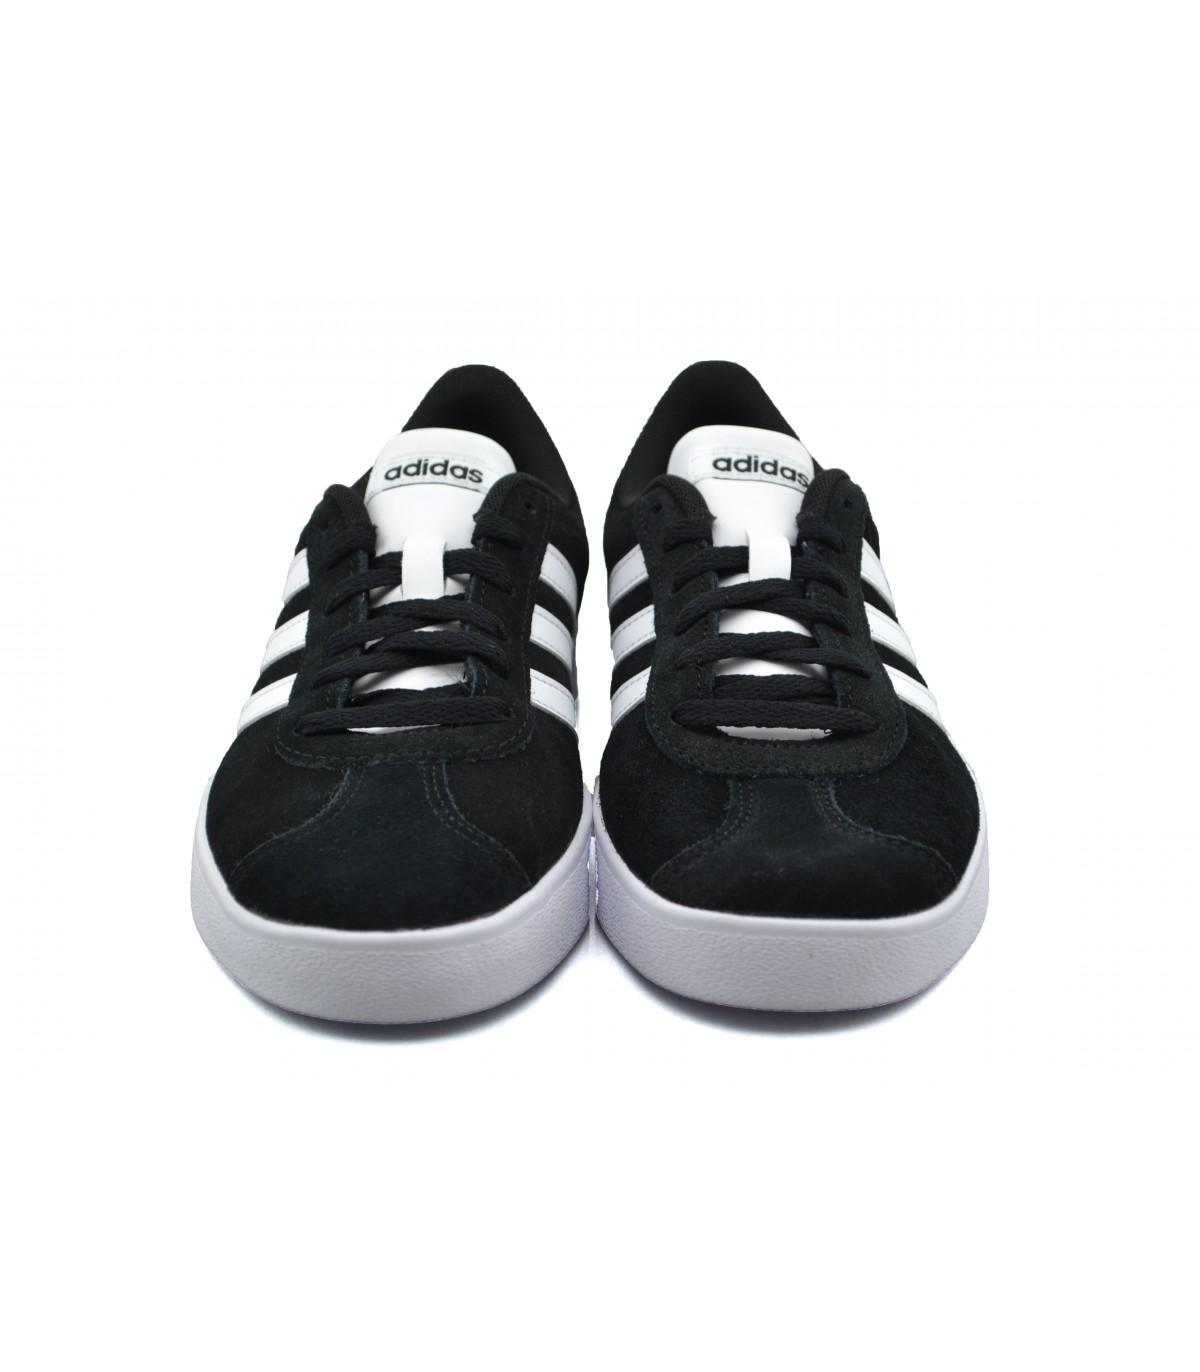 Adidas Online Zapatos Db1827 Calzado Deportivas Xr8xwtqr Mujer qFgaC6x